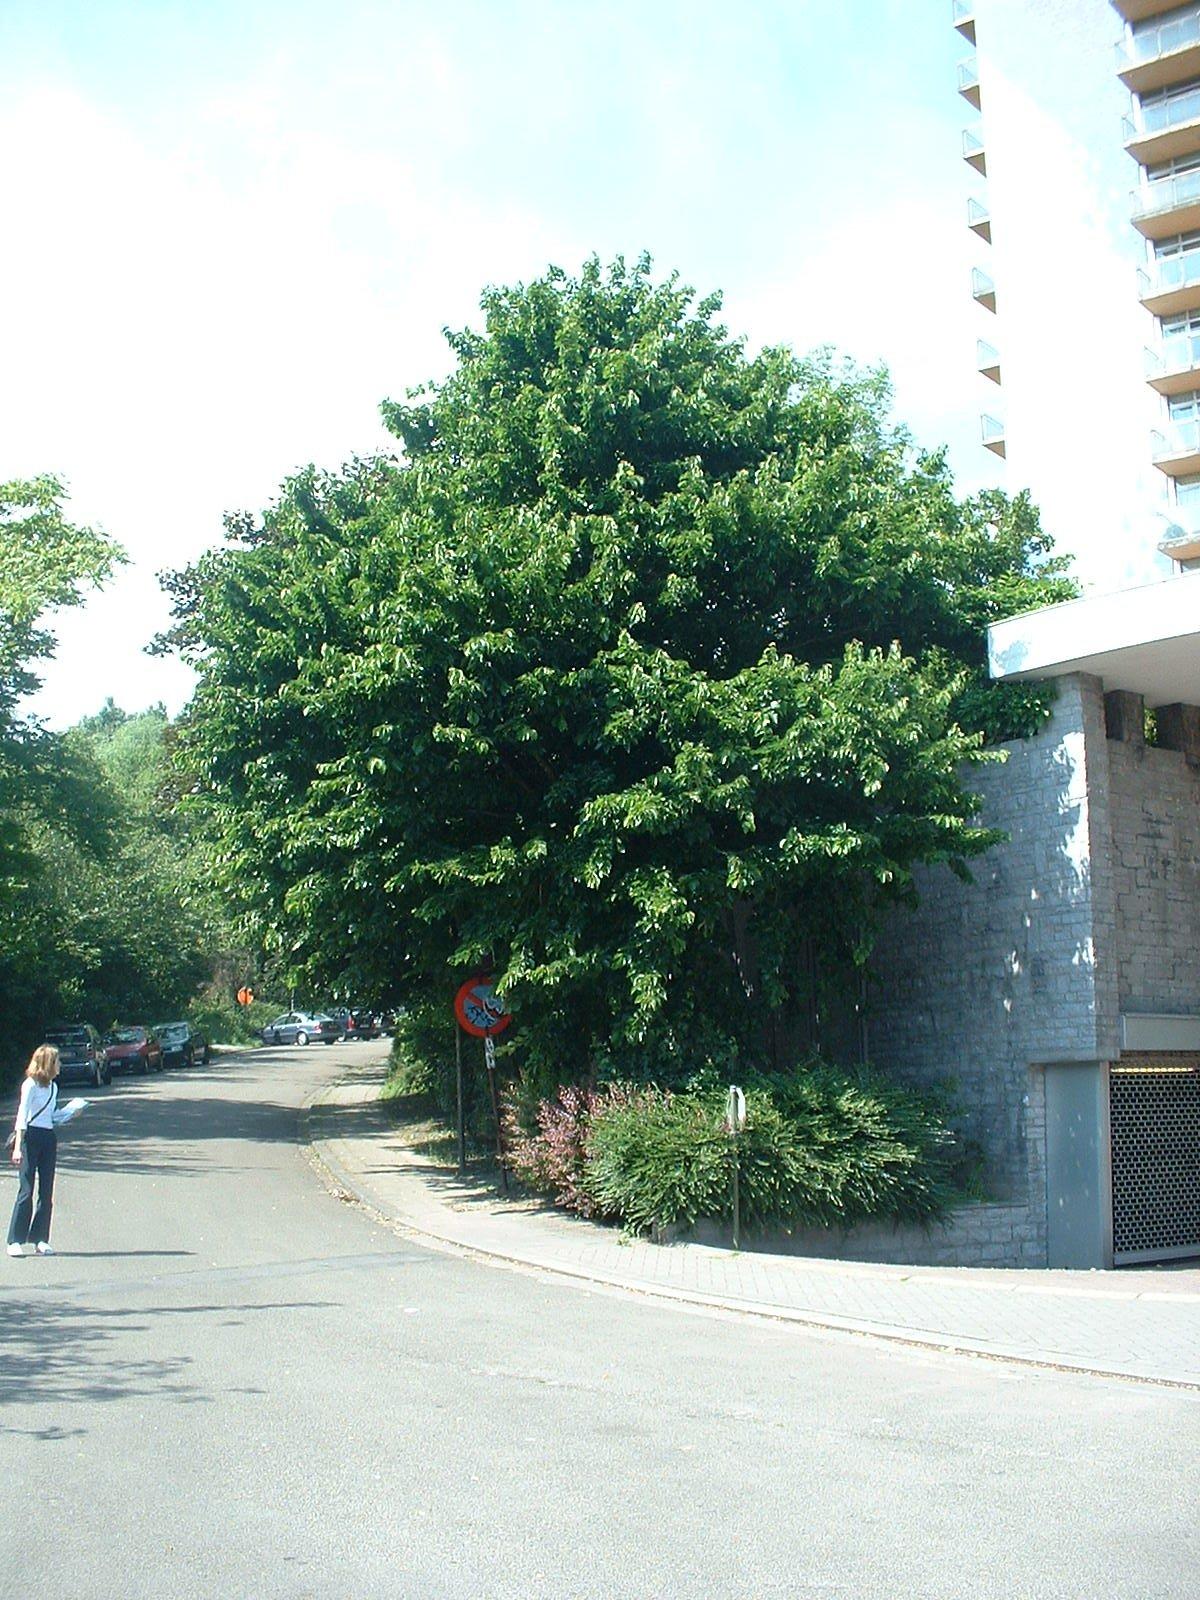 Noisetier de Byzance – Molenbeek-Saint-Jean, Avenue Maurice Van Hemelrijck –  07 Juin 2004